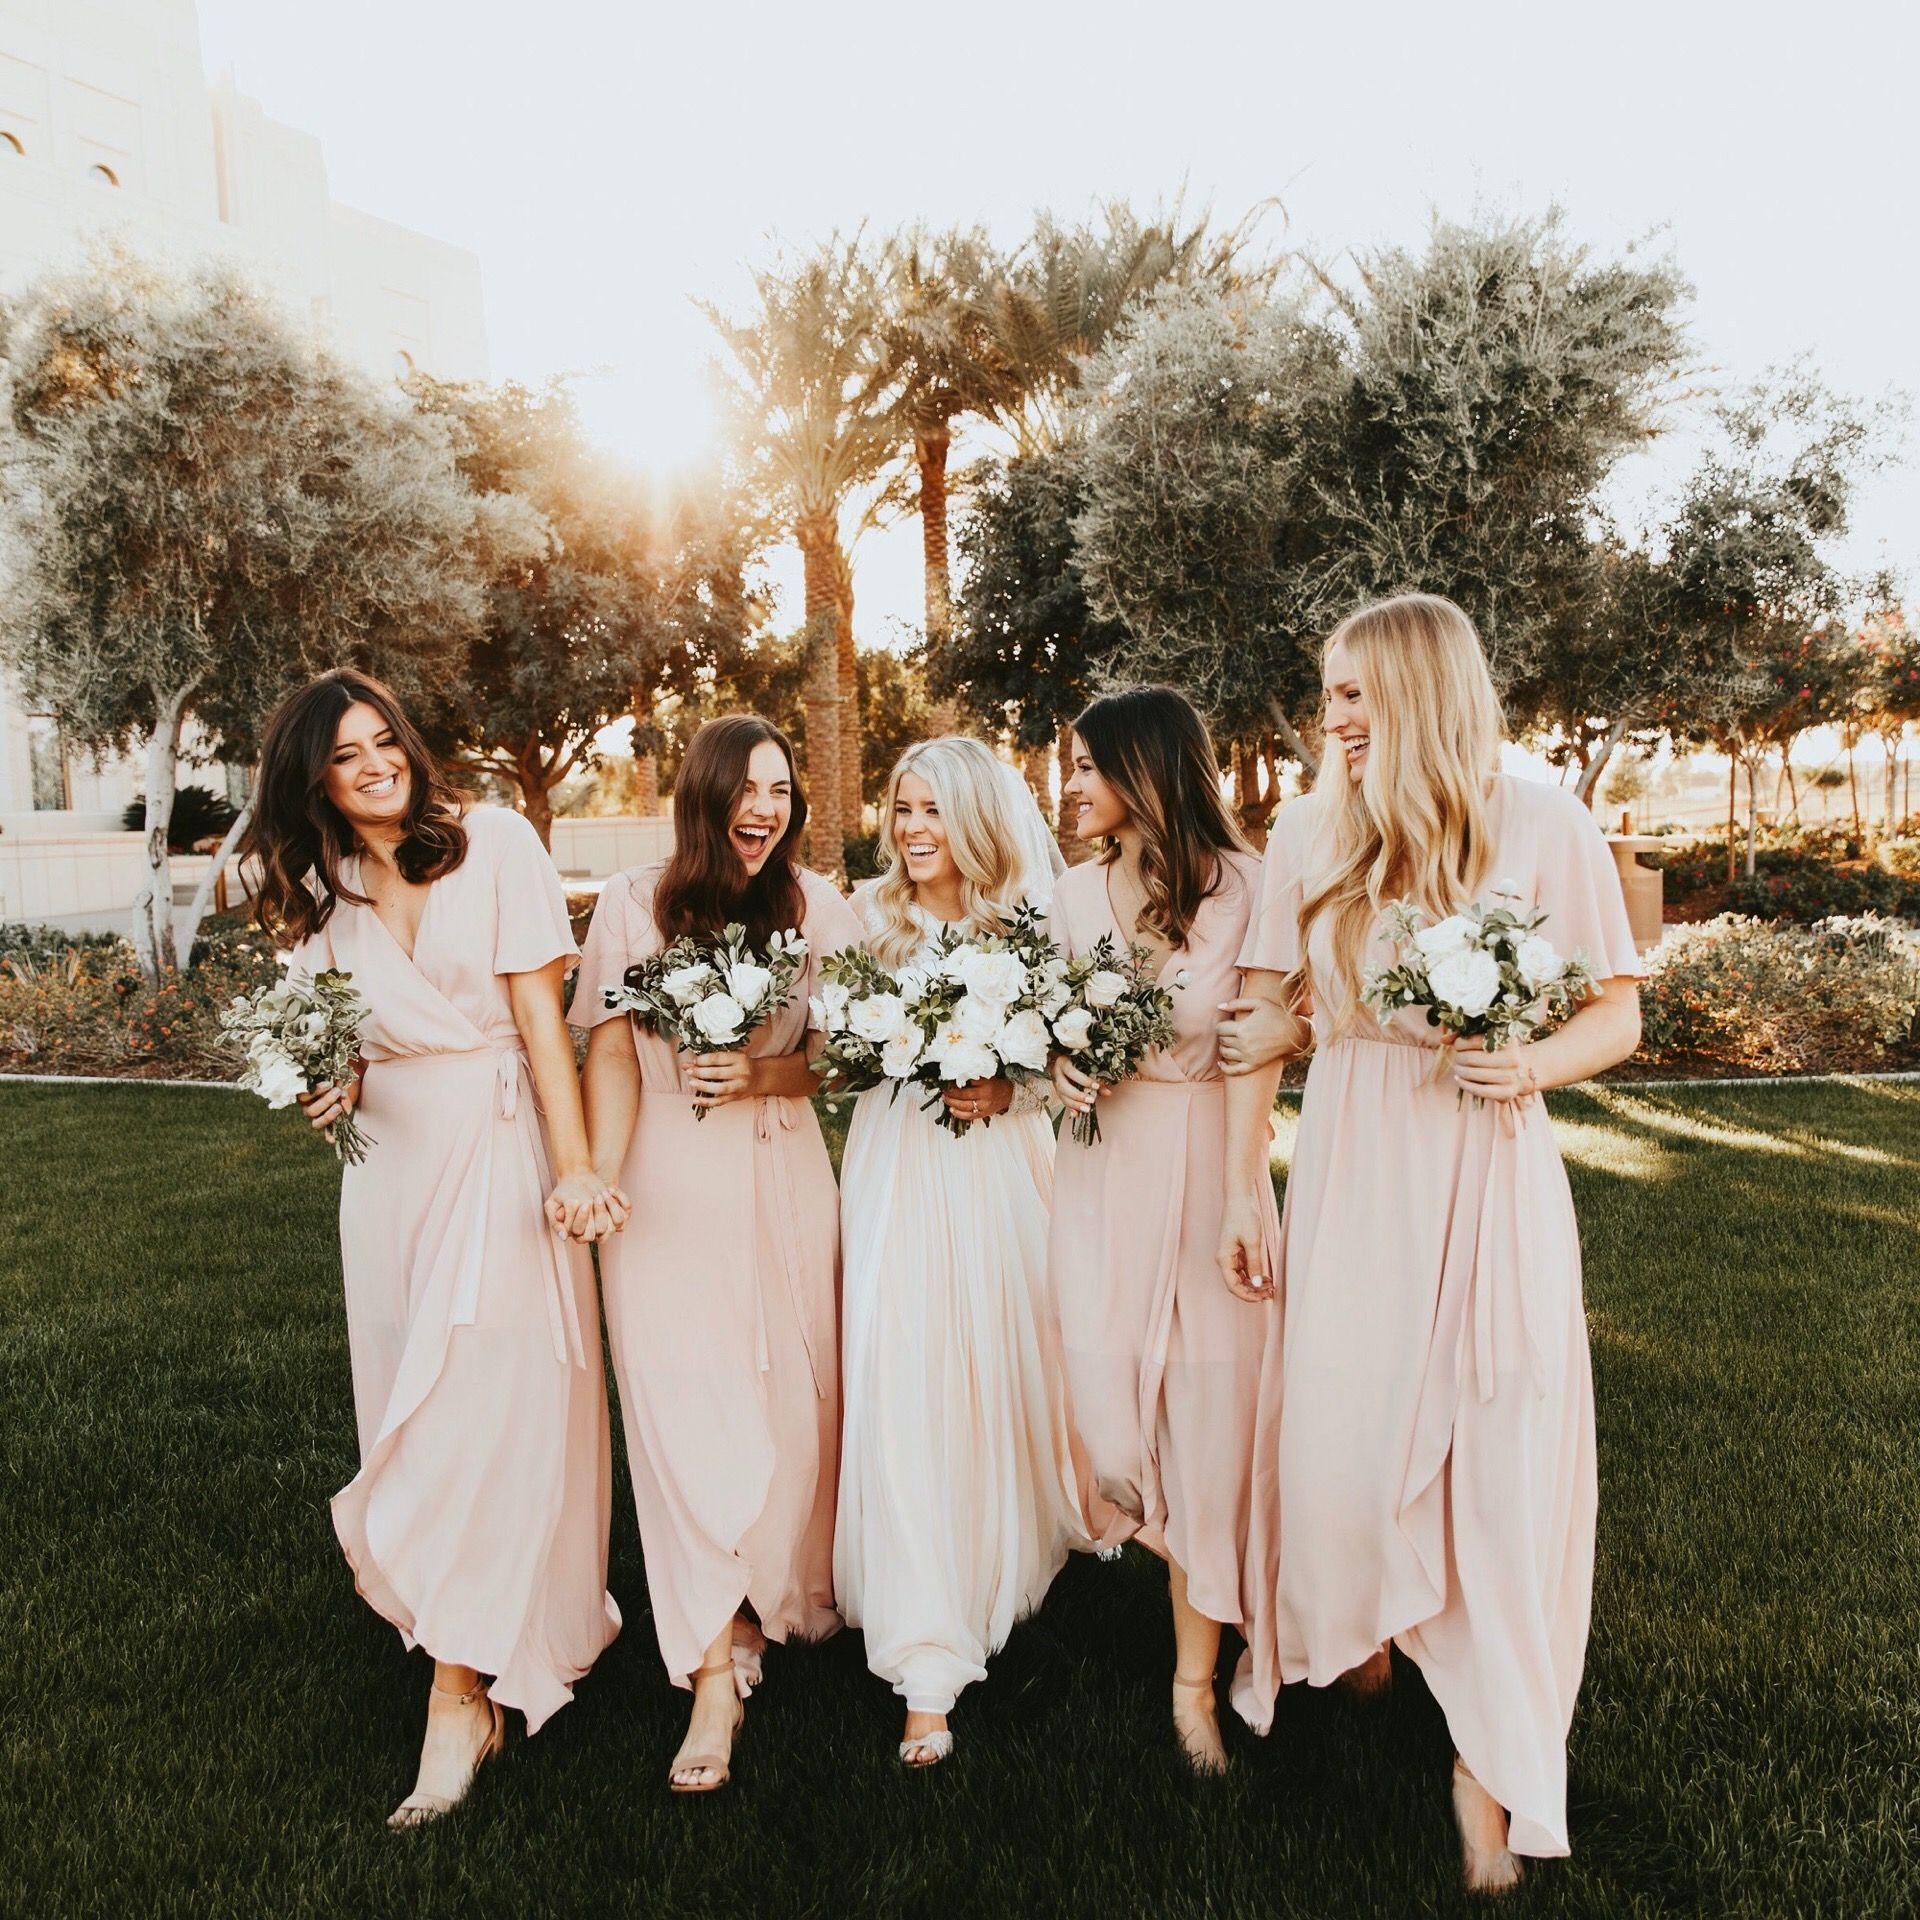 89c7a0cdb56  BLAIREWILSON ------ bridesmaid dresses